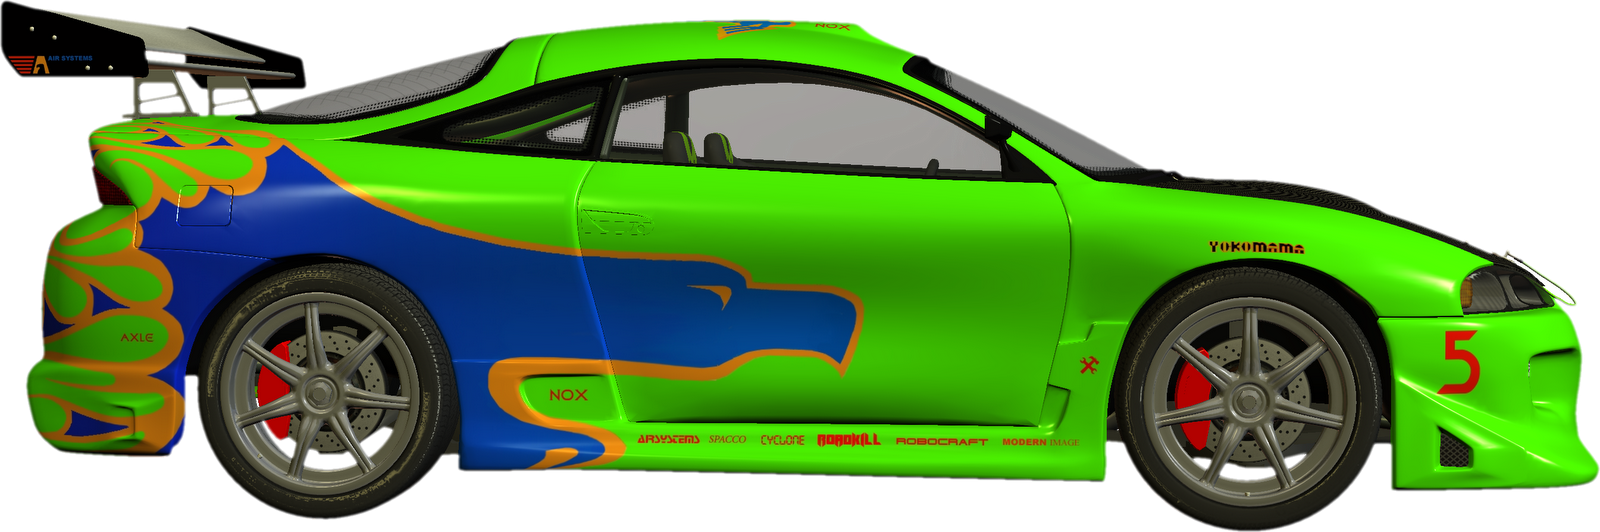 1600x532 Race Car Clipart Free Images 3